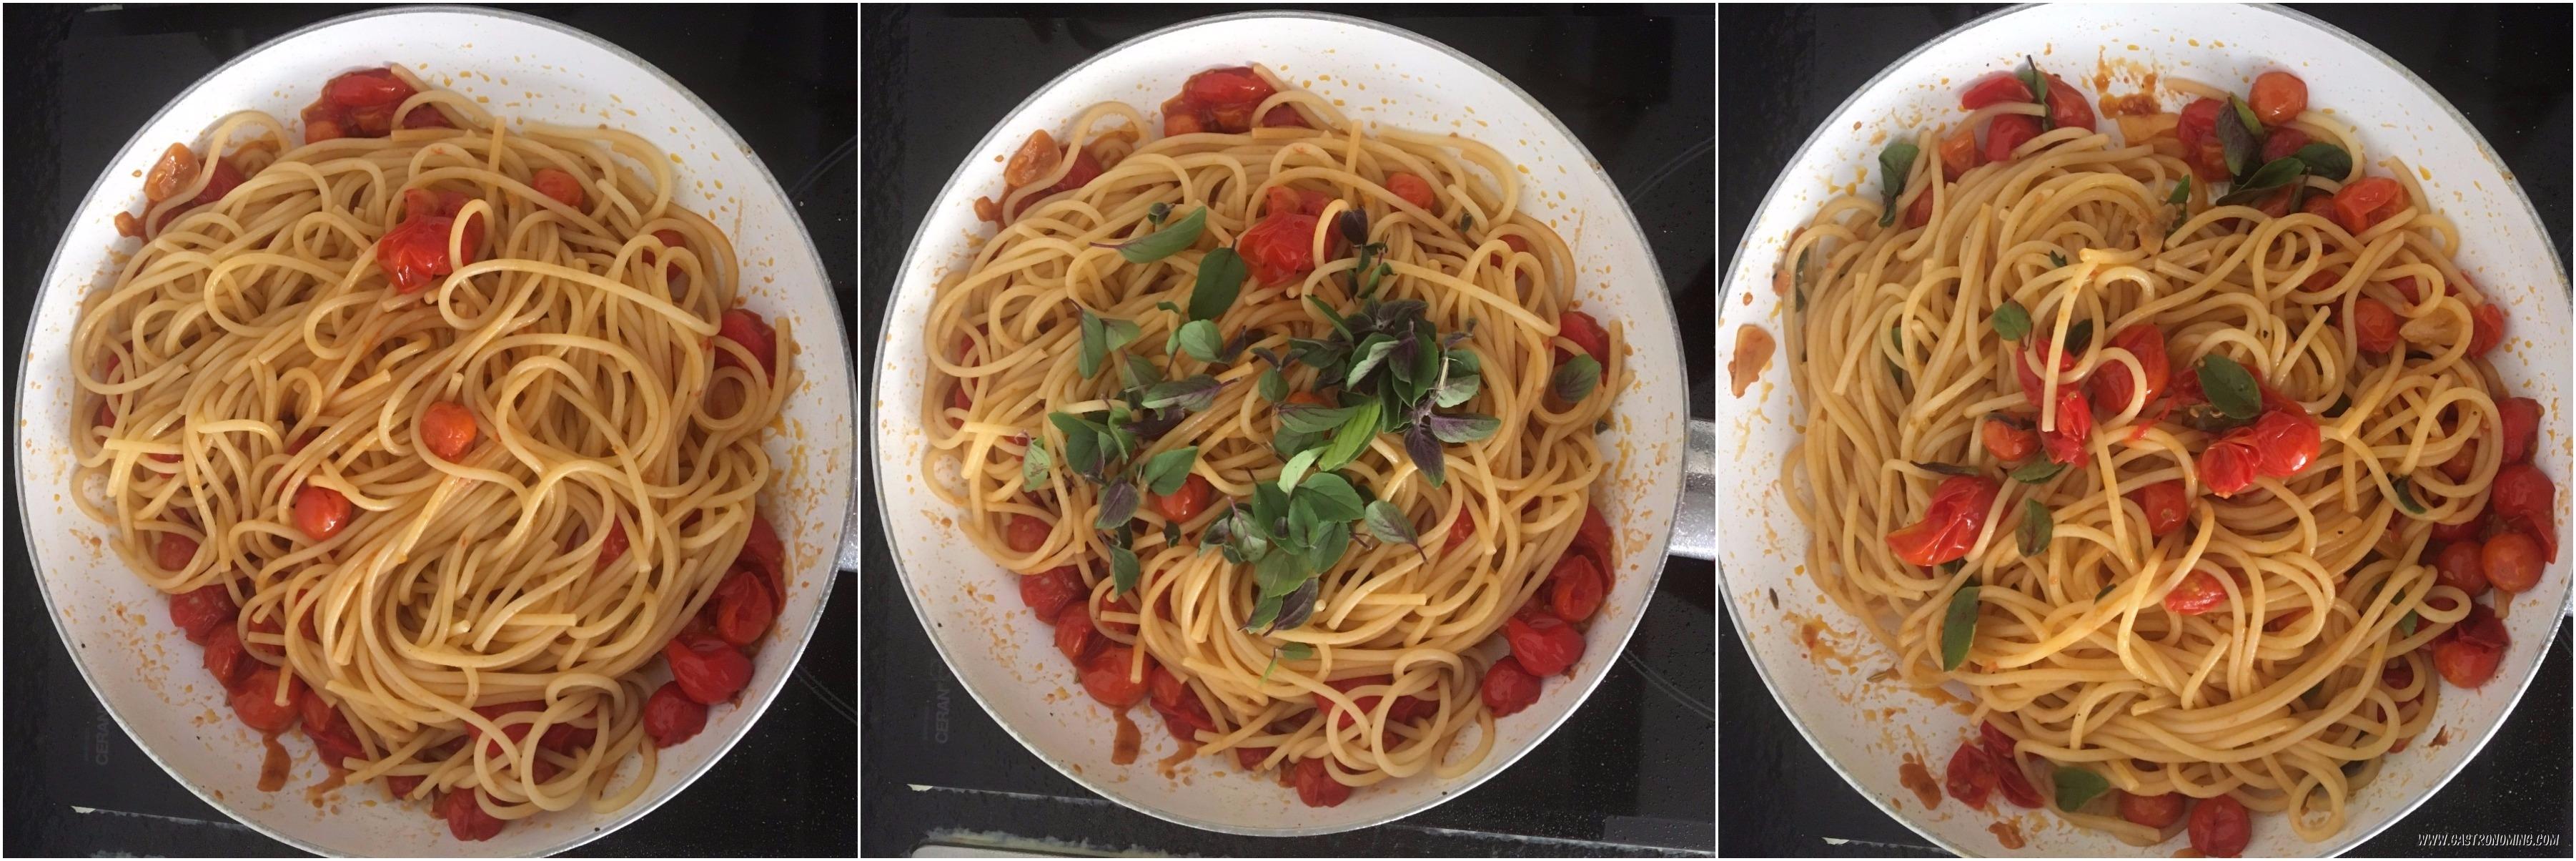 spaghetti e pomorodino